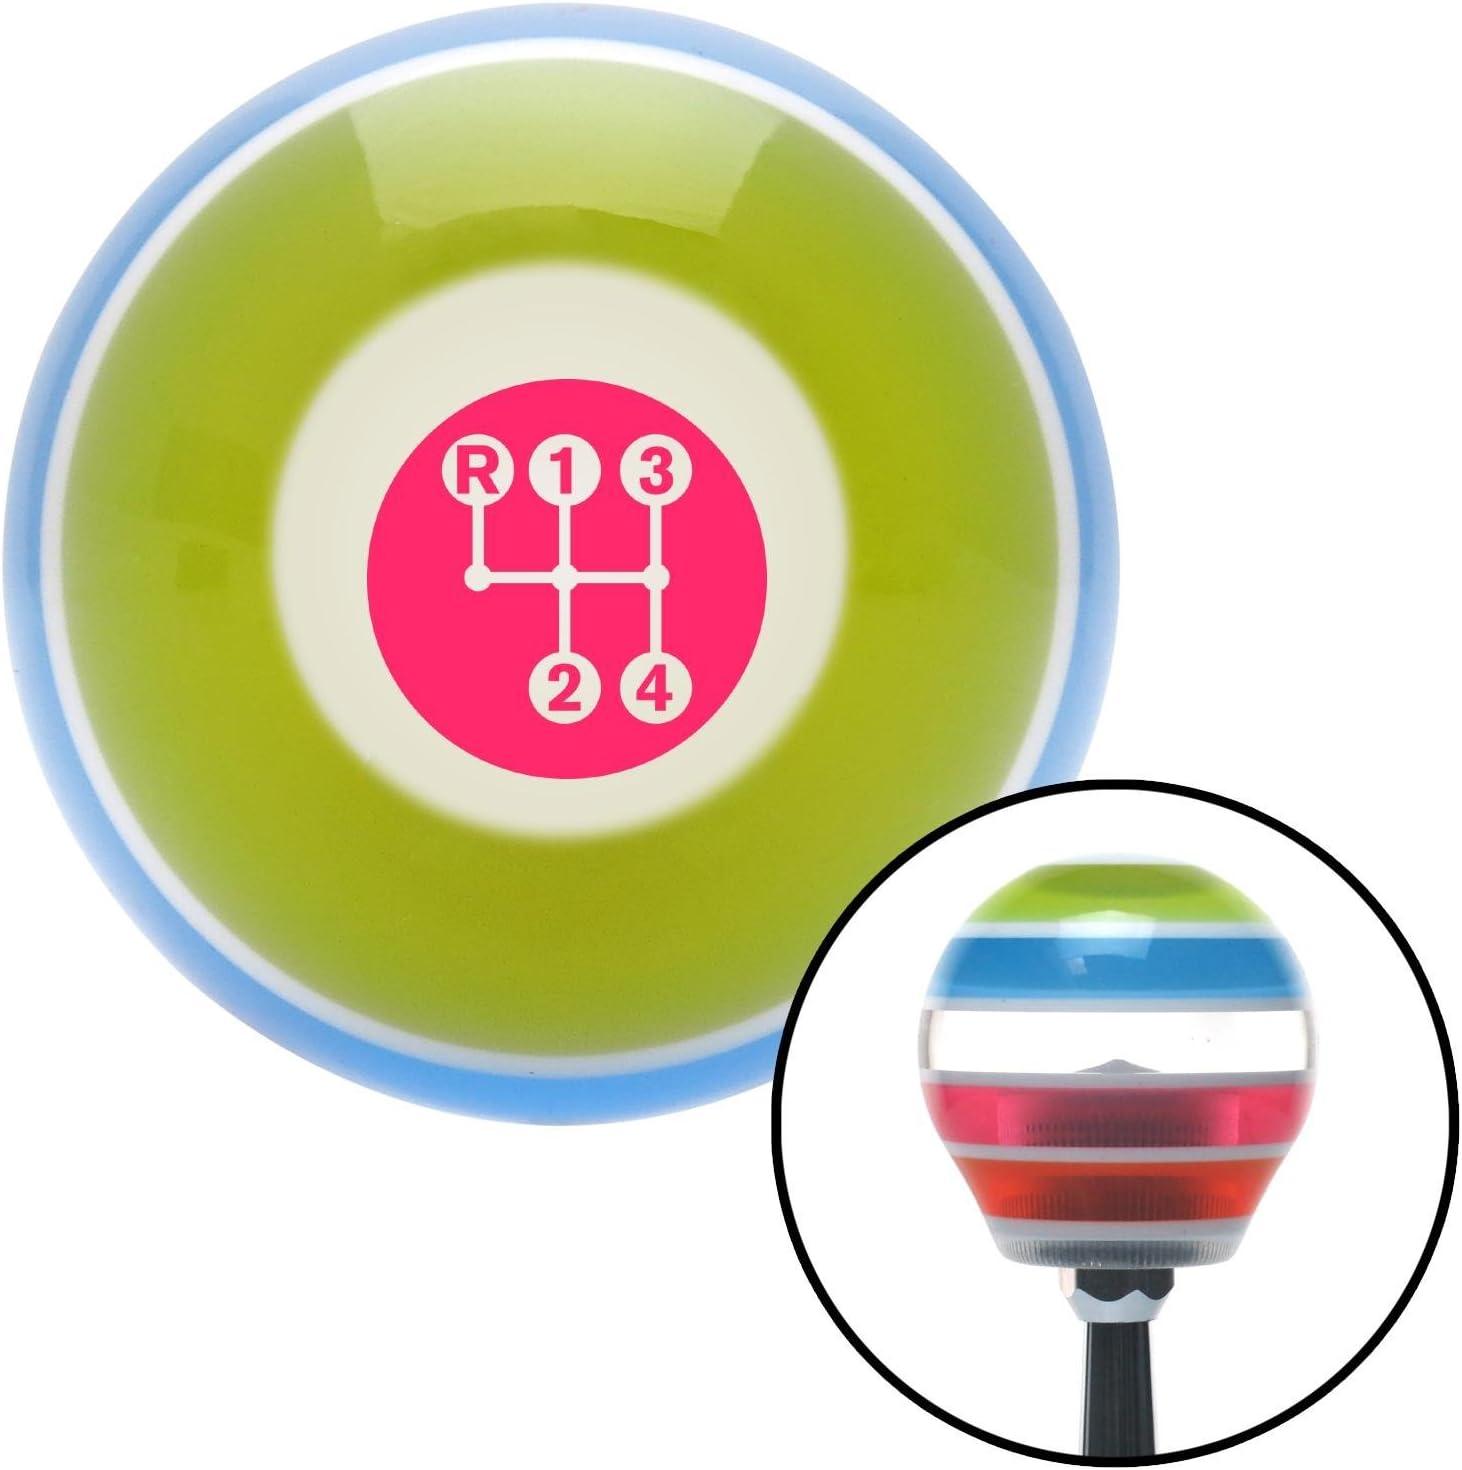 American Shifter 273132 Pink 4 Speed Pattern-Dots 3 Stripe Shift Knob with M16 x 1.5 Insert